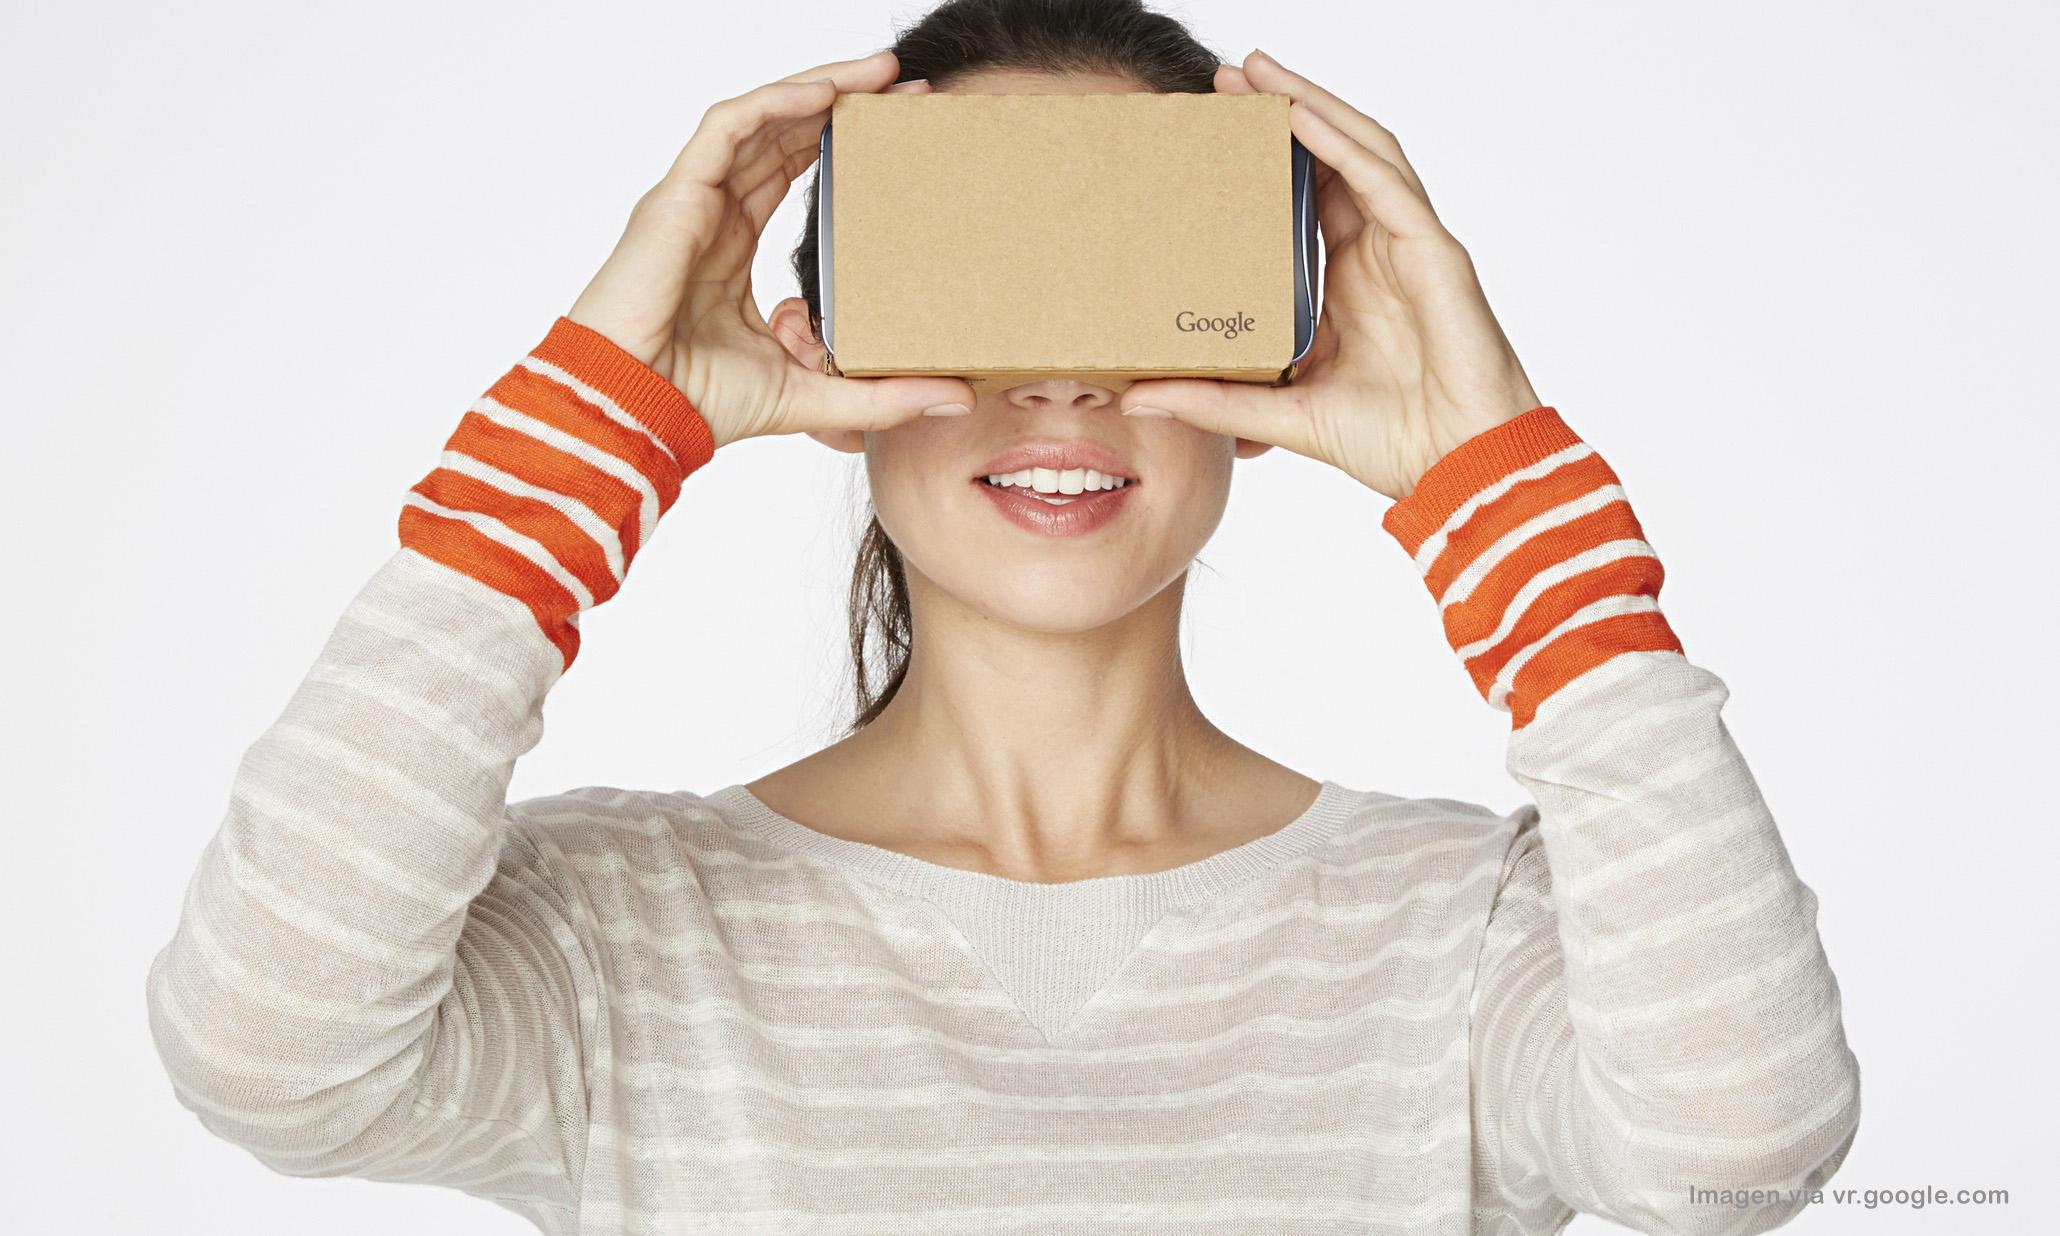 todoandroid360 - Cardboard Google Vr